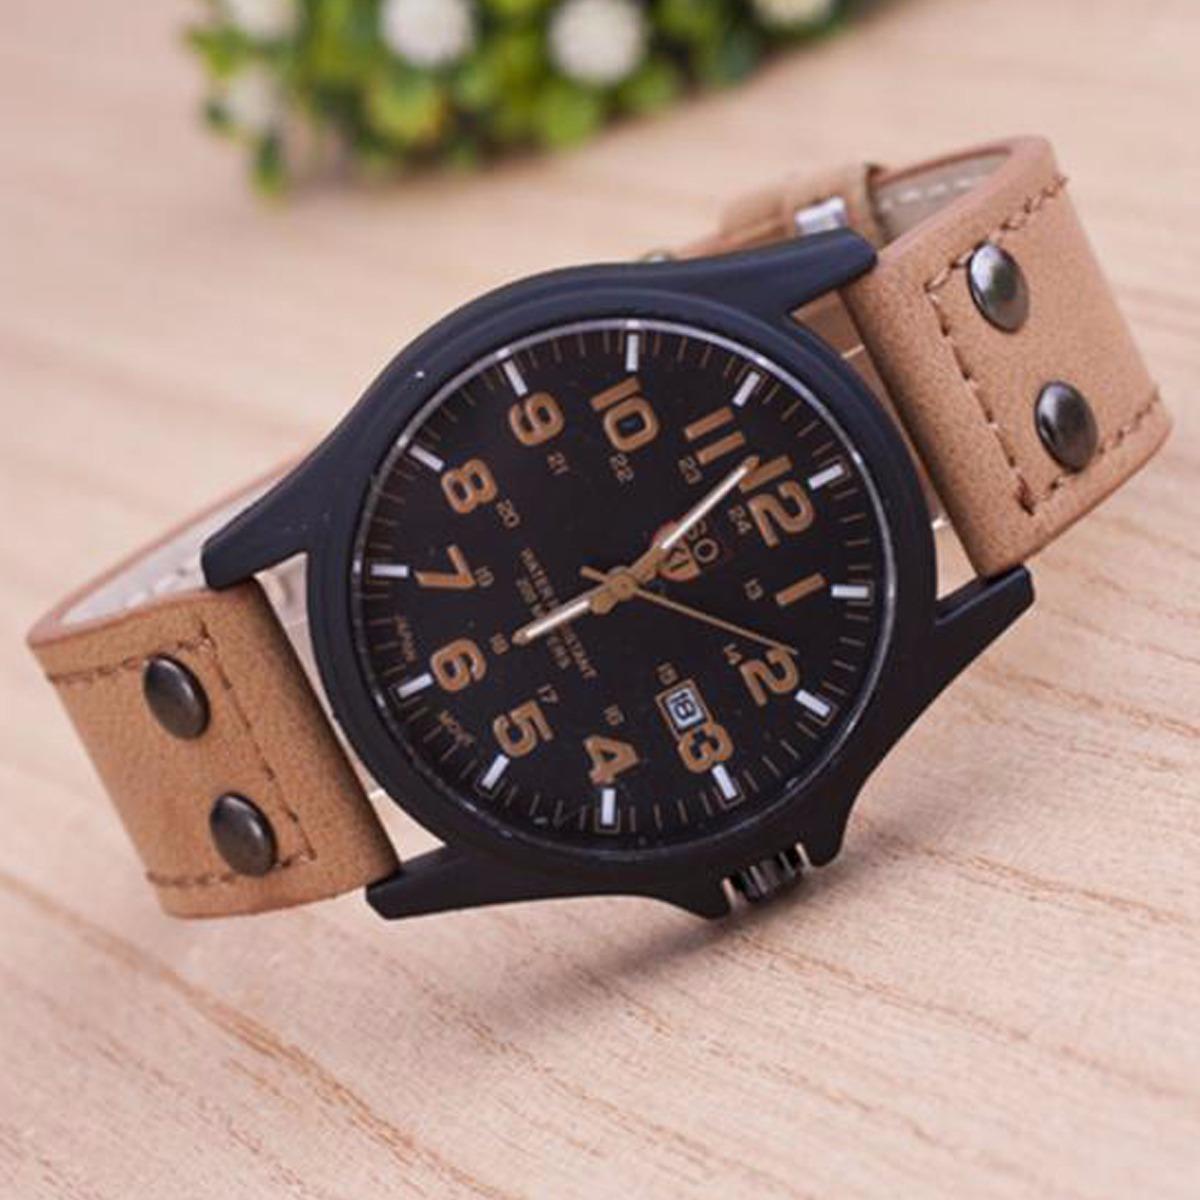 b9173642f18 relógio masculino pulseira couro relogio militar baratos sok. Carregando  zoom.